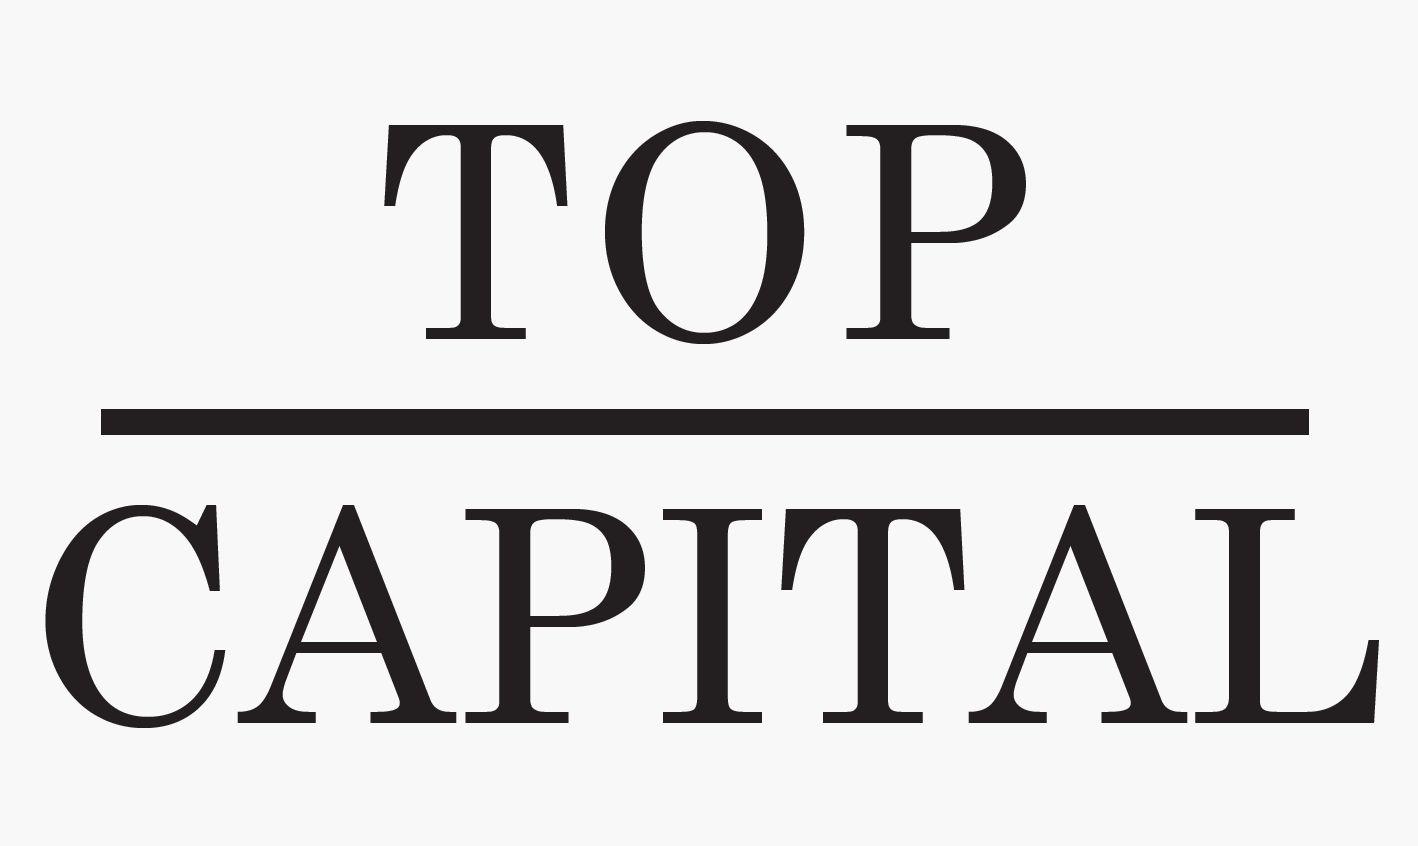 Top Capital